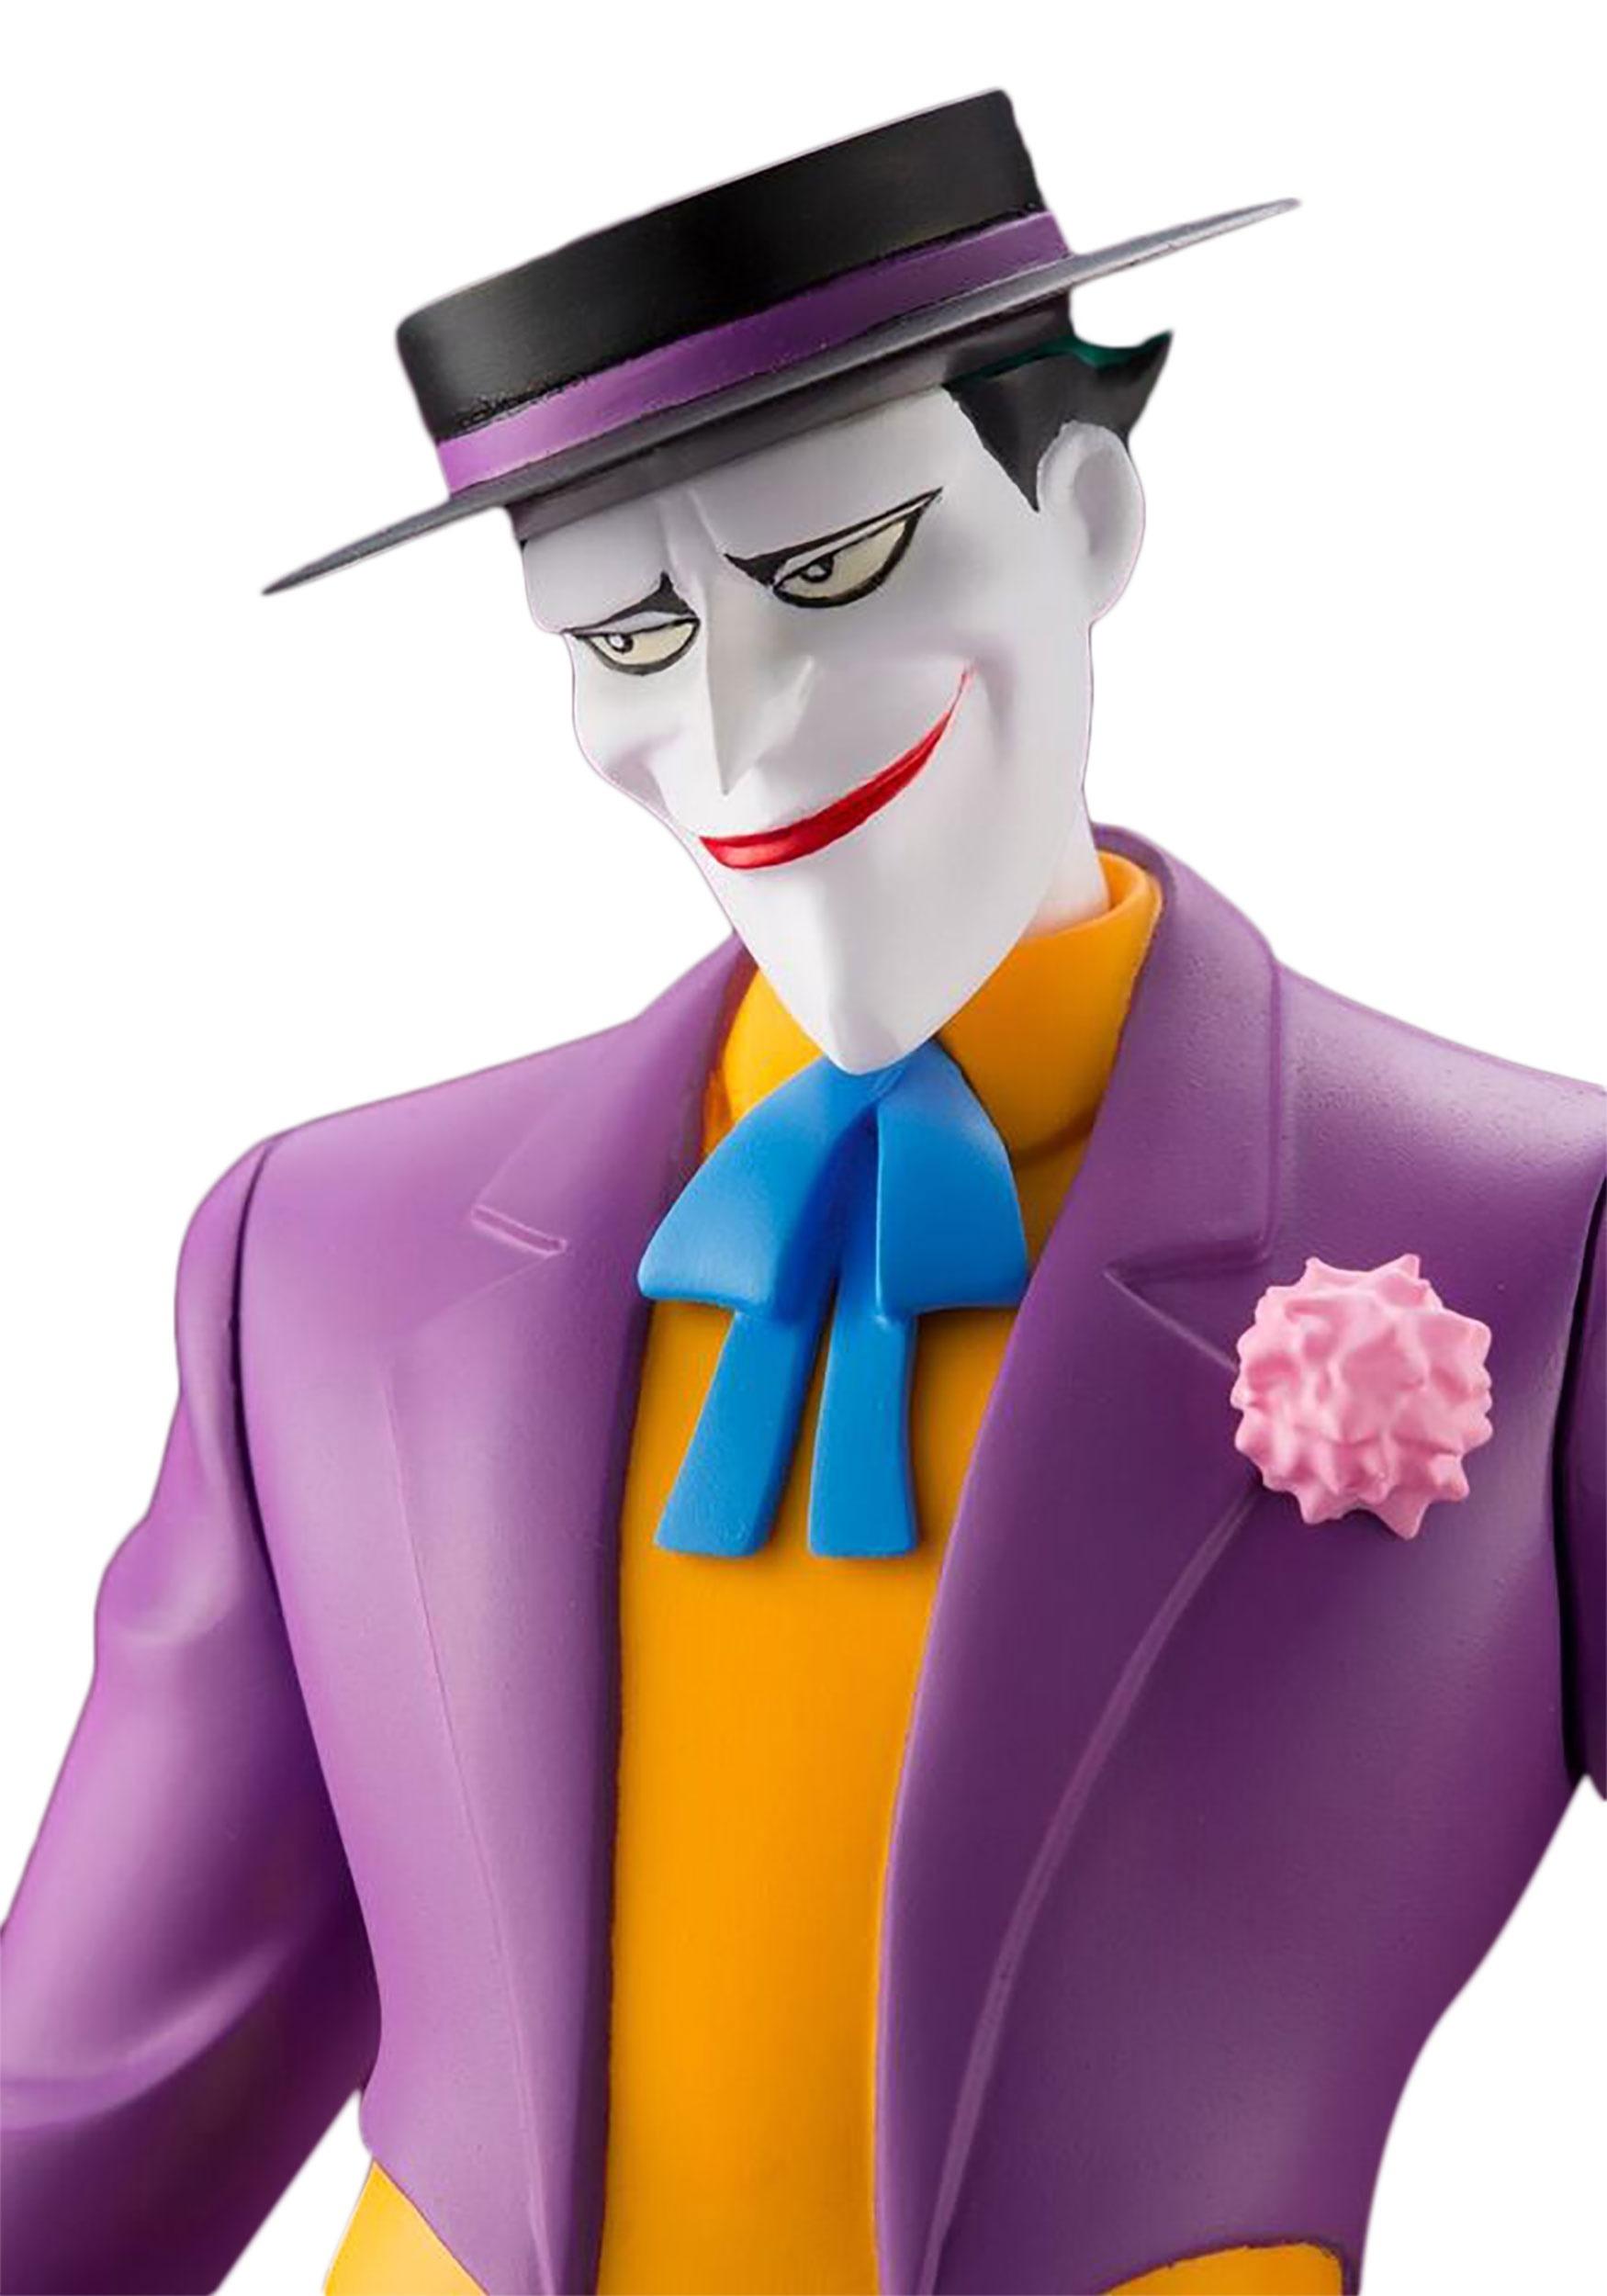 Batman The Animated Series The Joker Artfx Statue